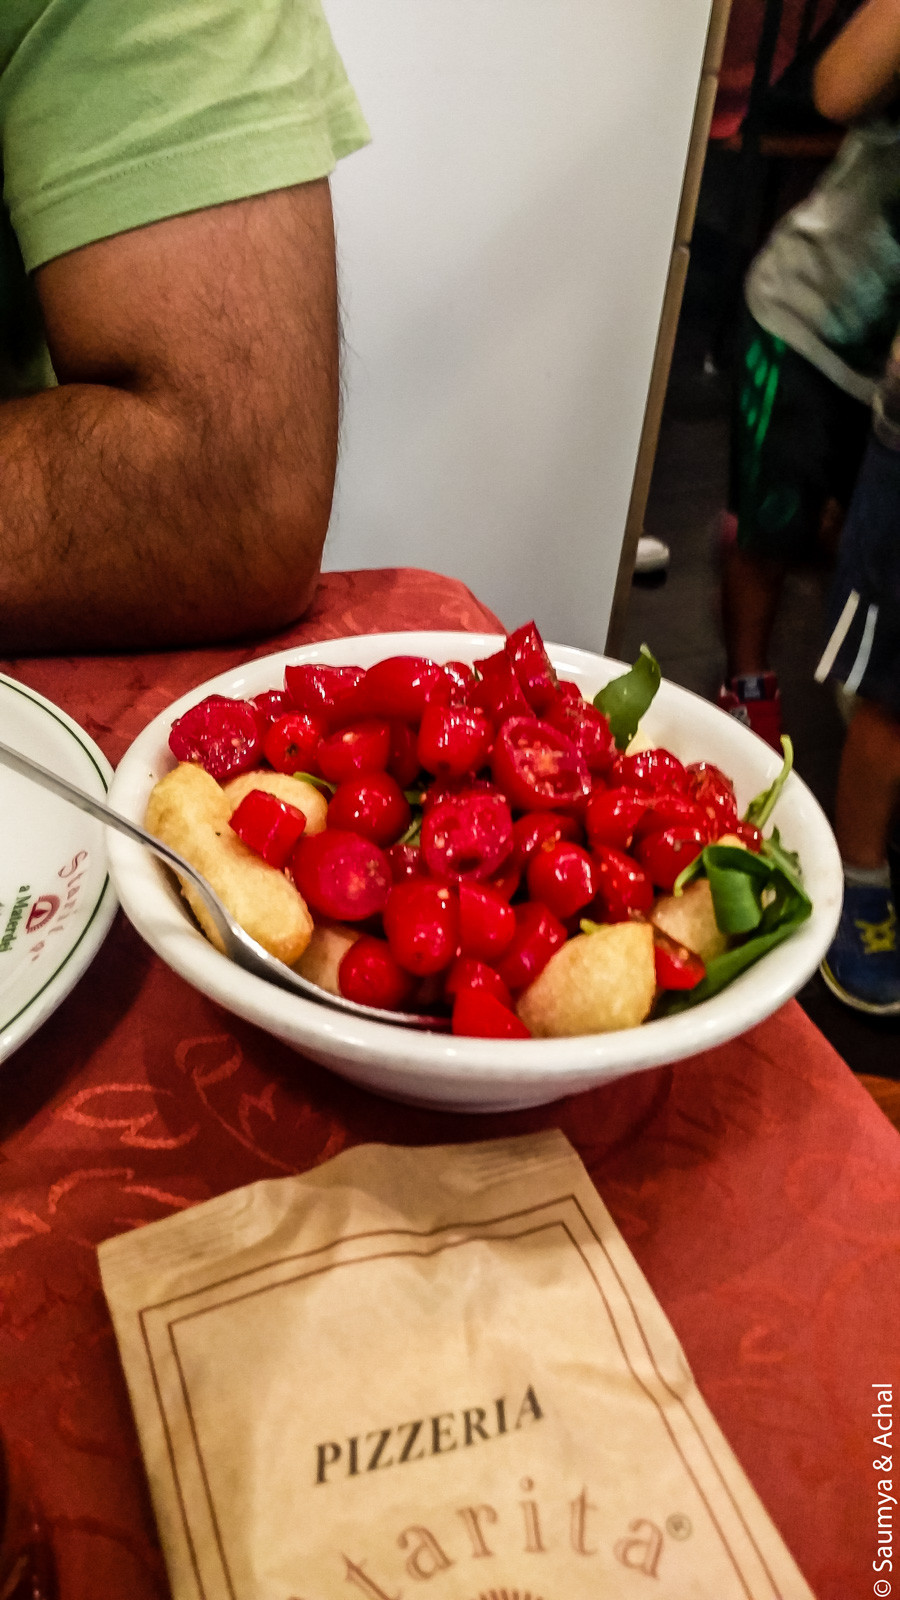 Salad @Starita, Naples